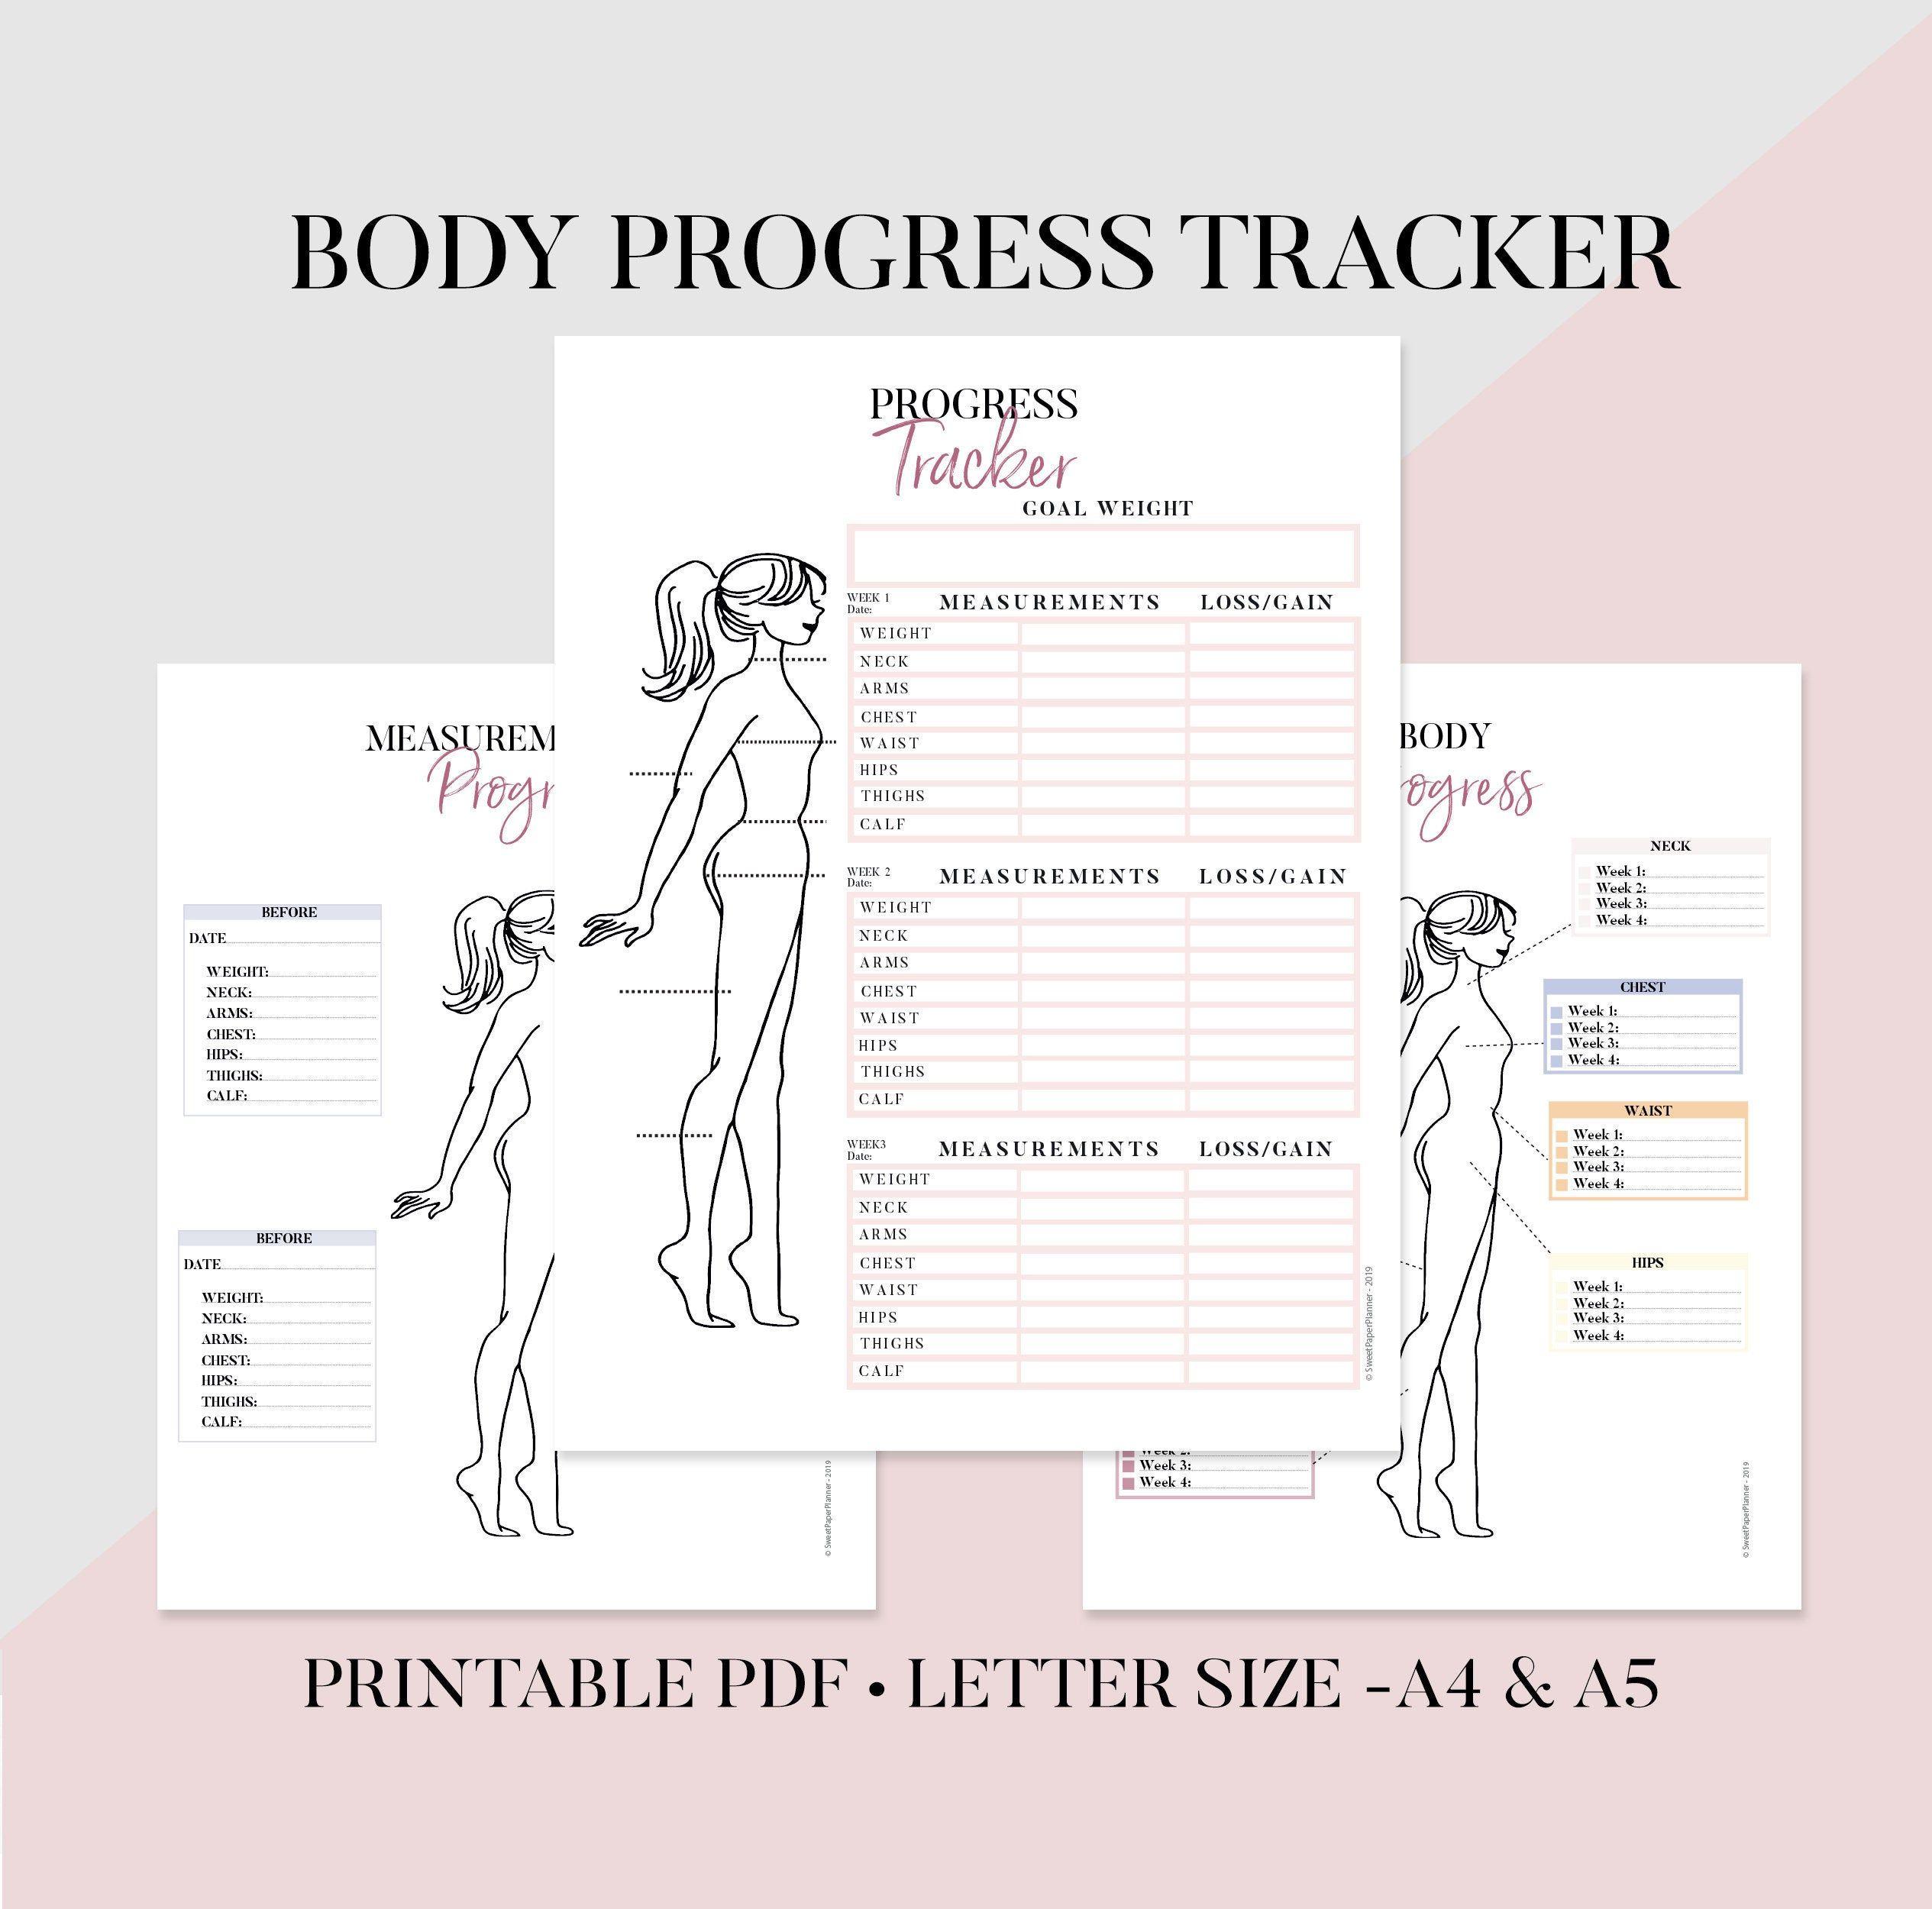 Body Progress Tracker Printable, Body Measurements Tracker, Weight Loss Tracker, Fitness Tracker, Health and wellness, health and fitness -   15 fitness Tracker measurements ideas